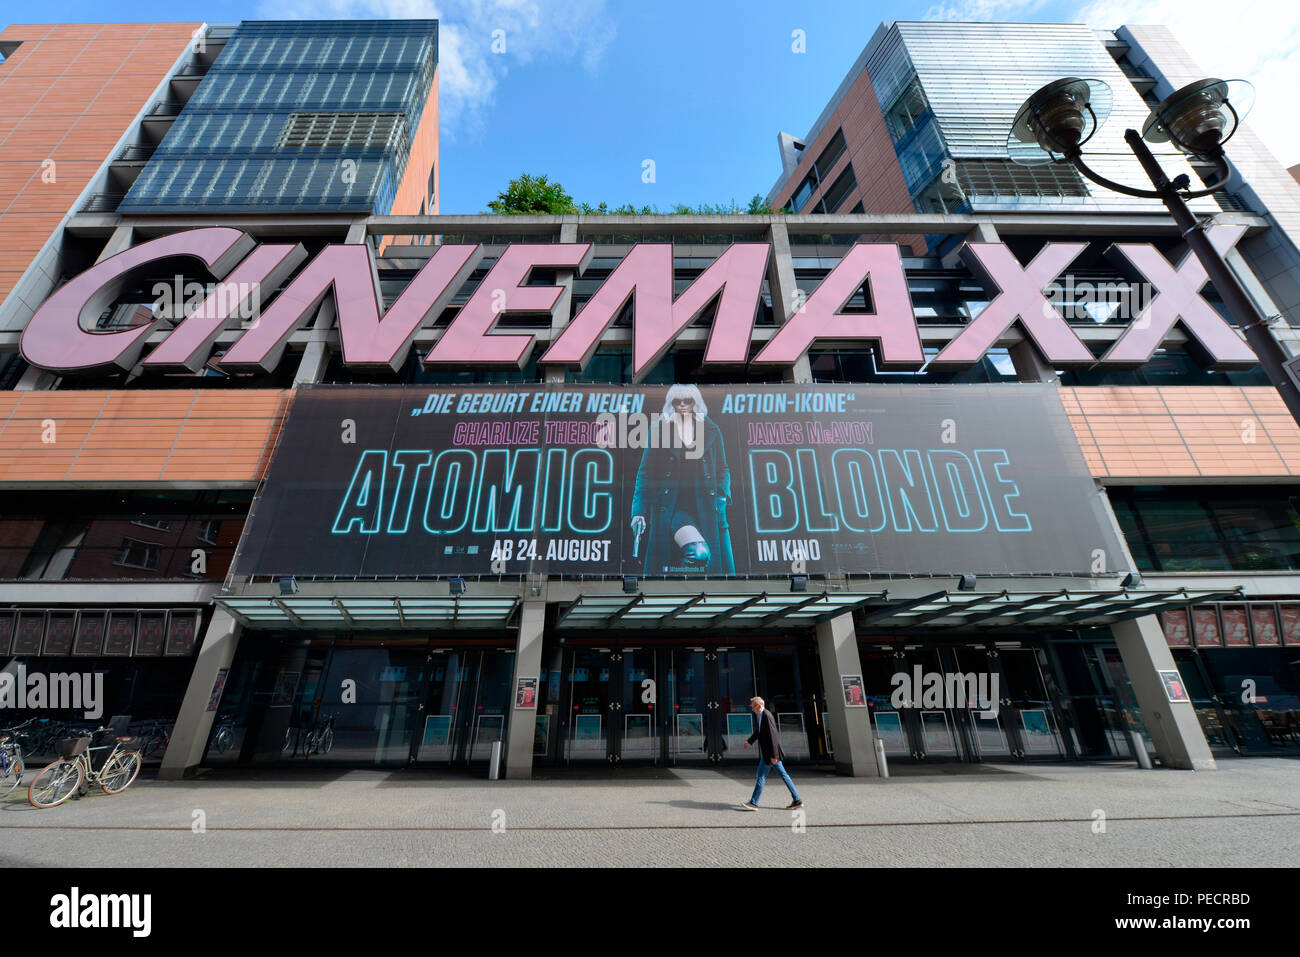 Cineplex Potsdam